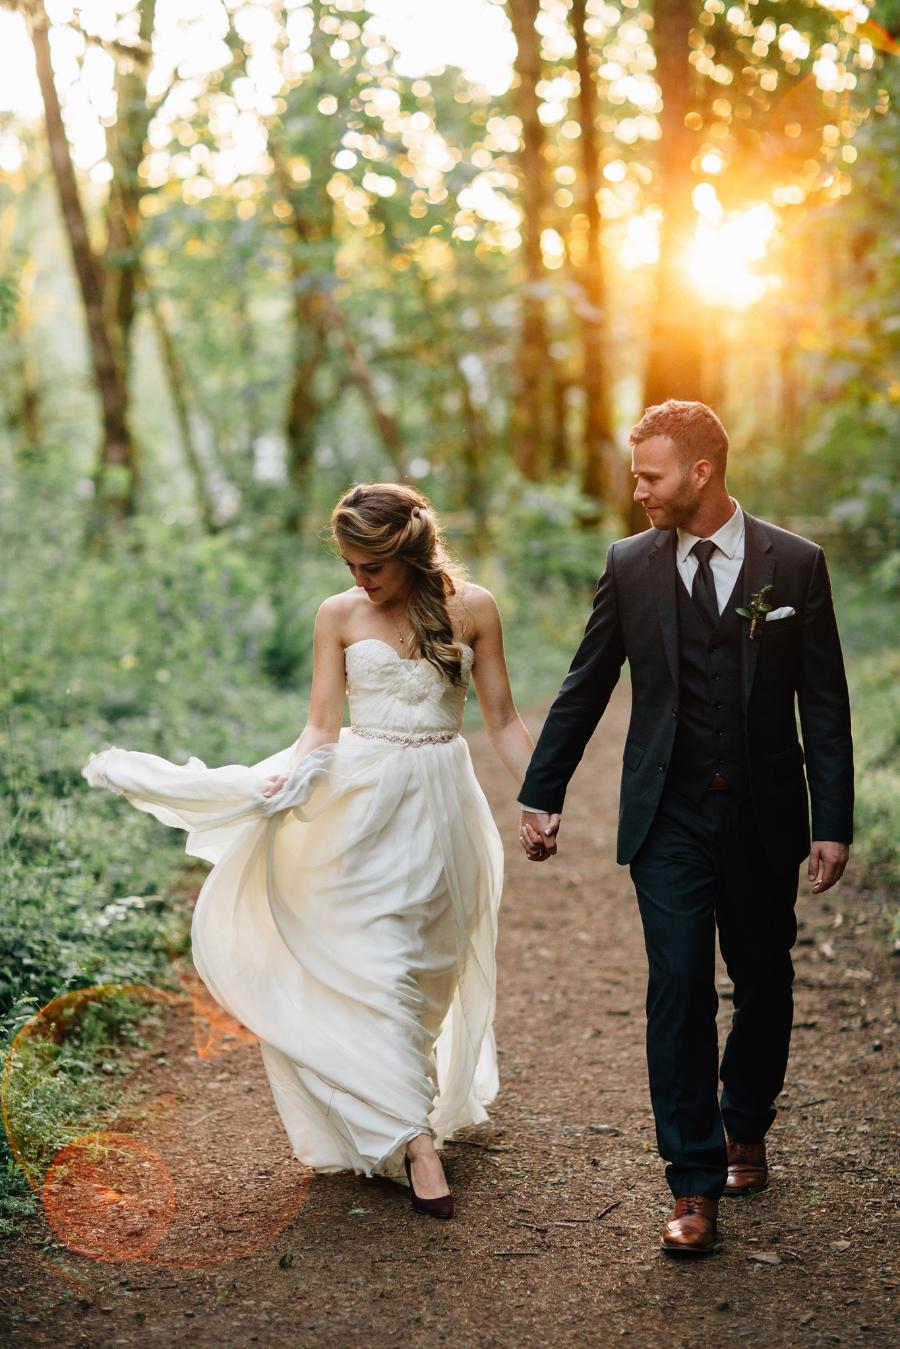 romantic bride and groom walk